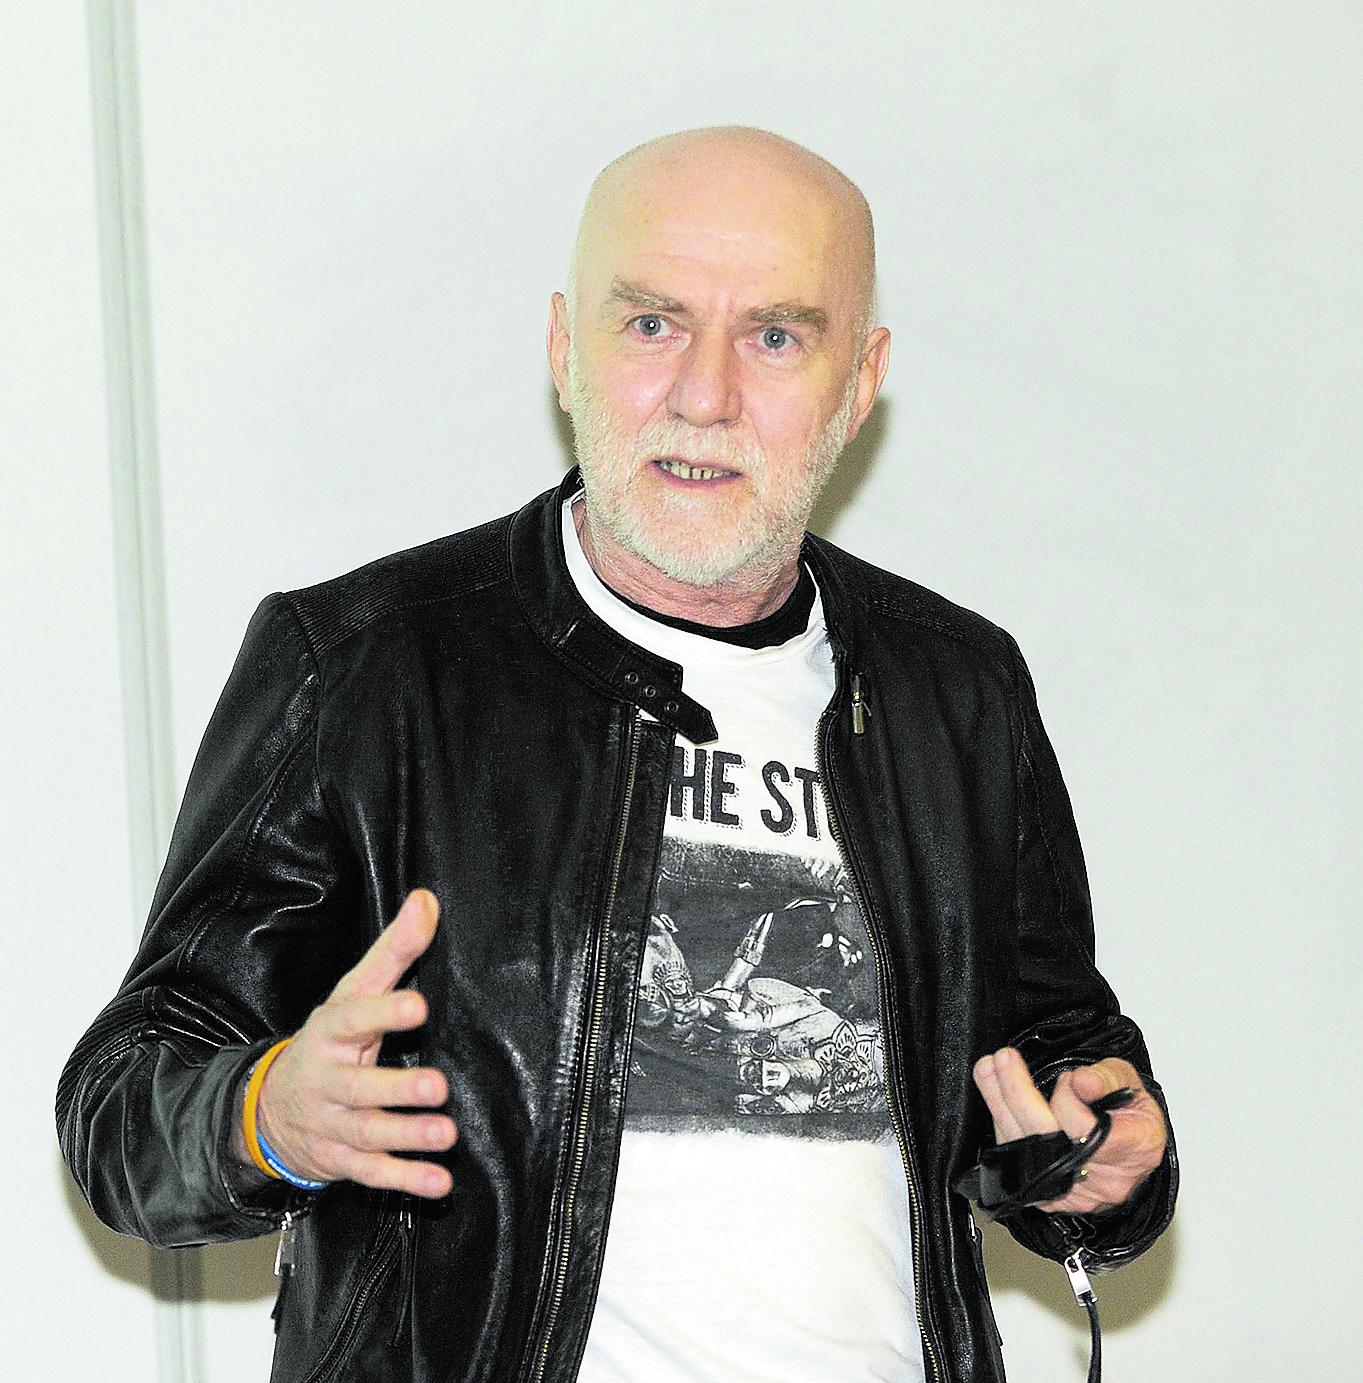 Mjere u interesu građevinara – Stjepan Šterc / Snimio Vedran KARUZA